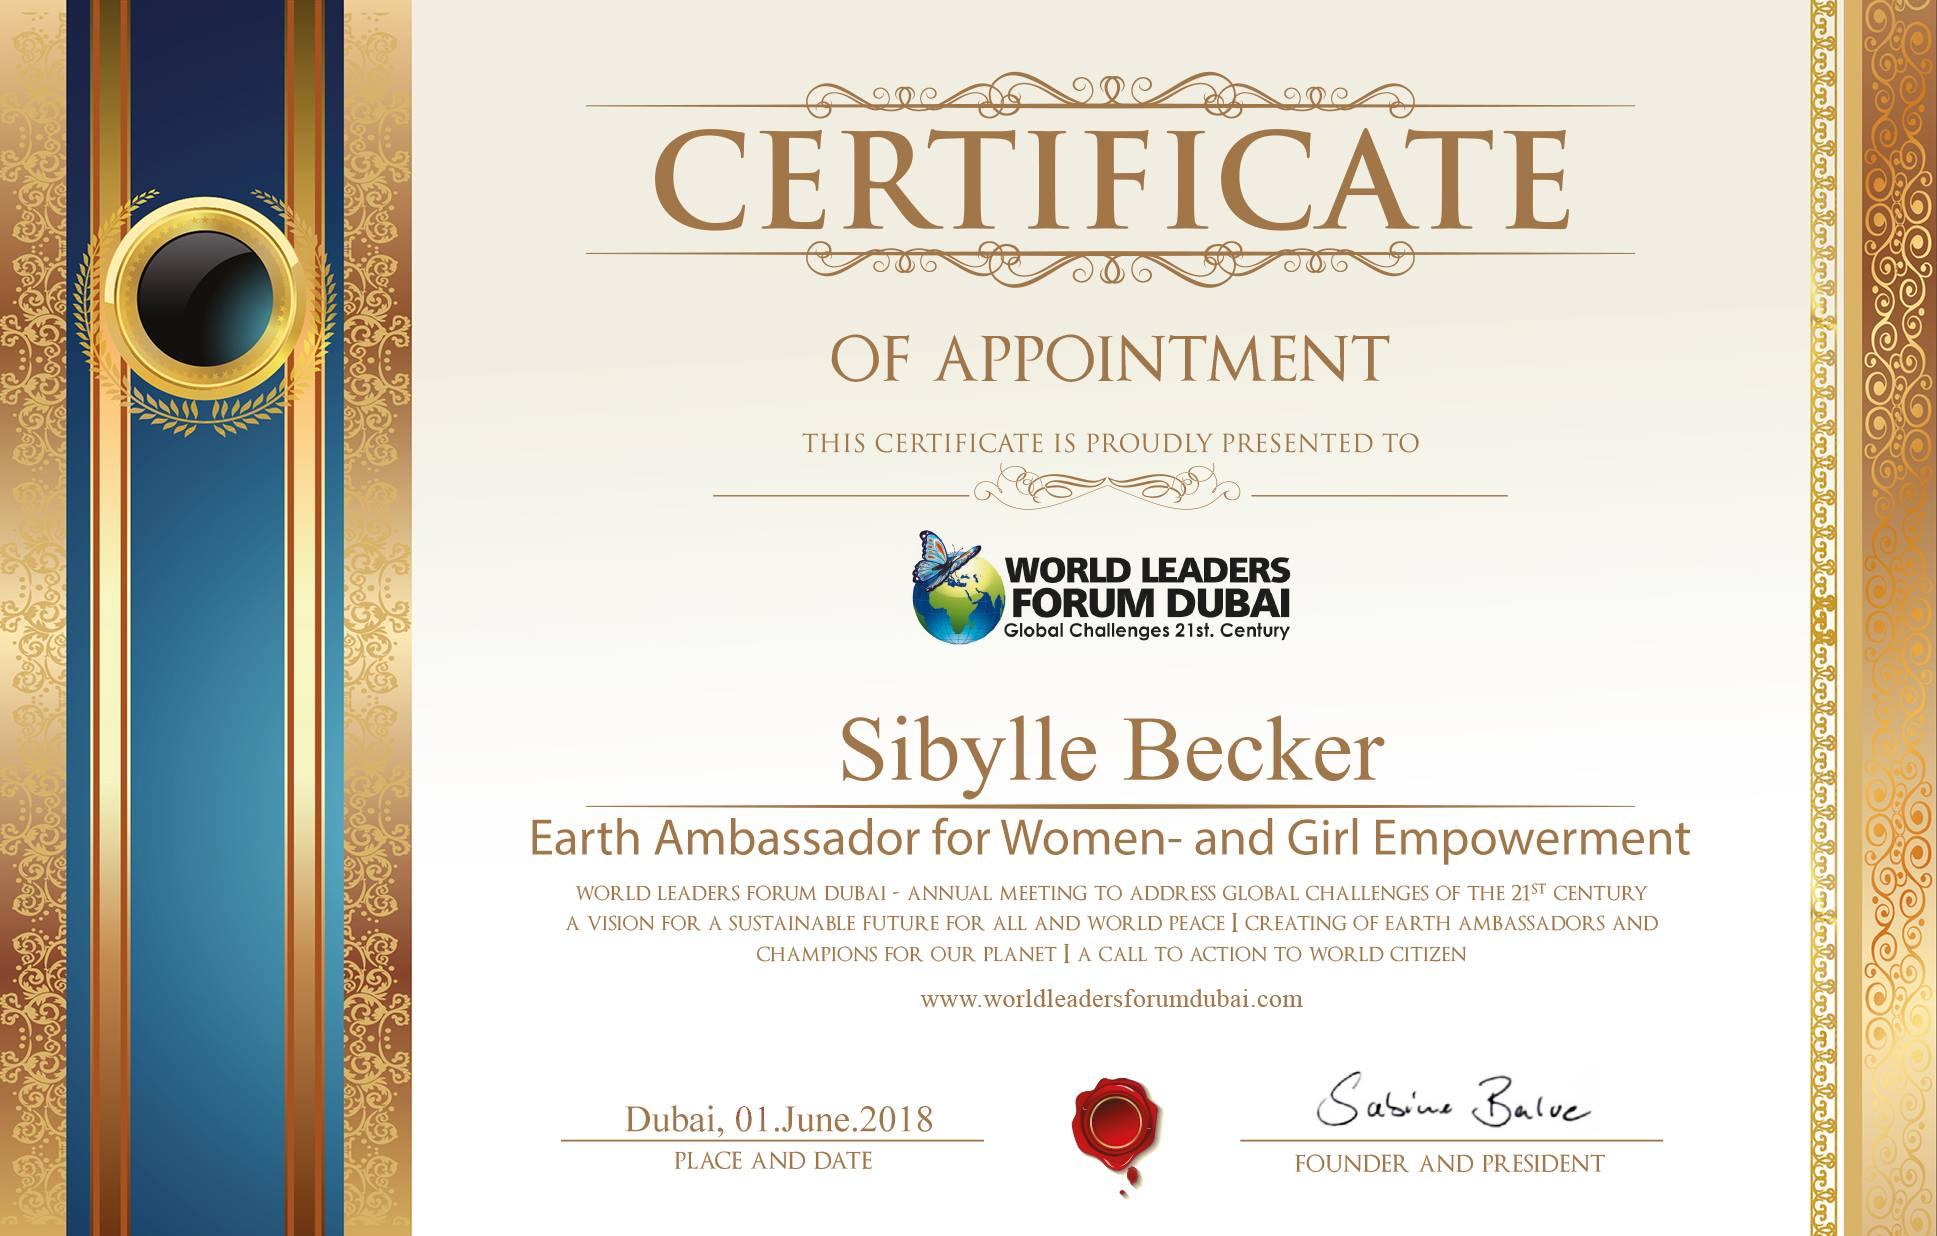 Sibylle_Becker_Earth_Ambassador_Award_World_Leaders_Forum_Dubai